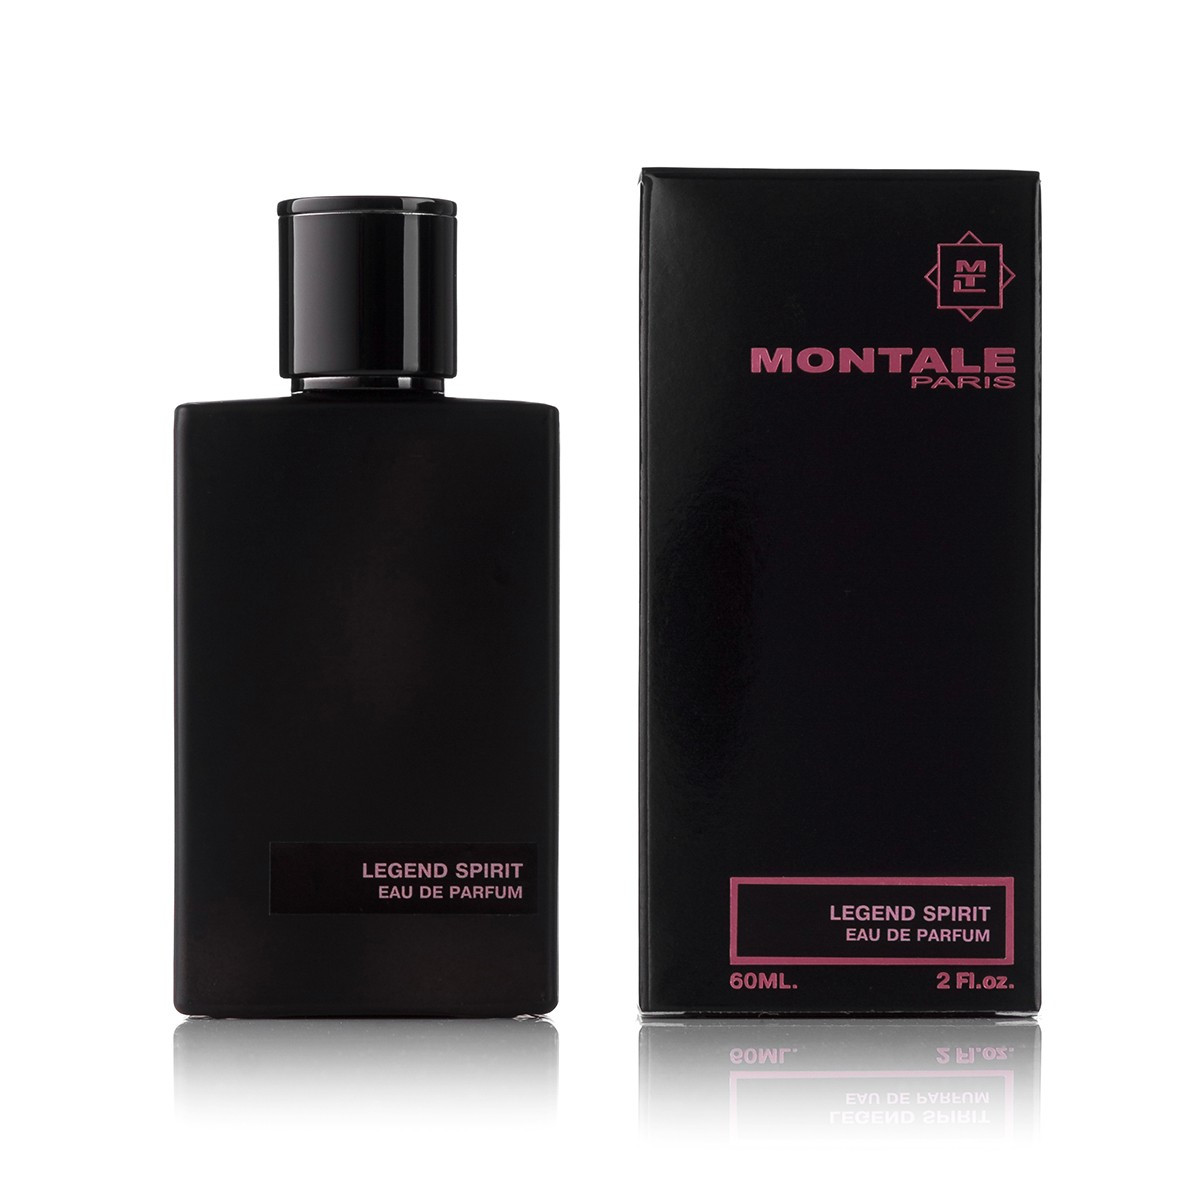 60 мл Montale Legend Spirit (Унісекс) - 60 мл (M-36)